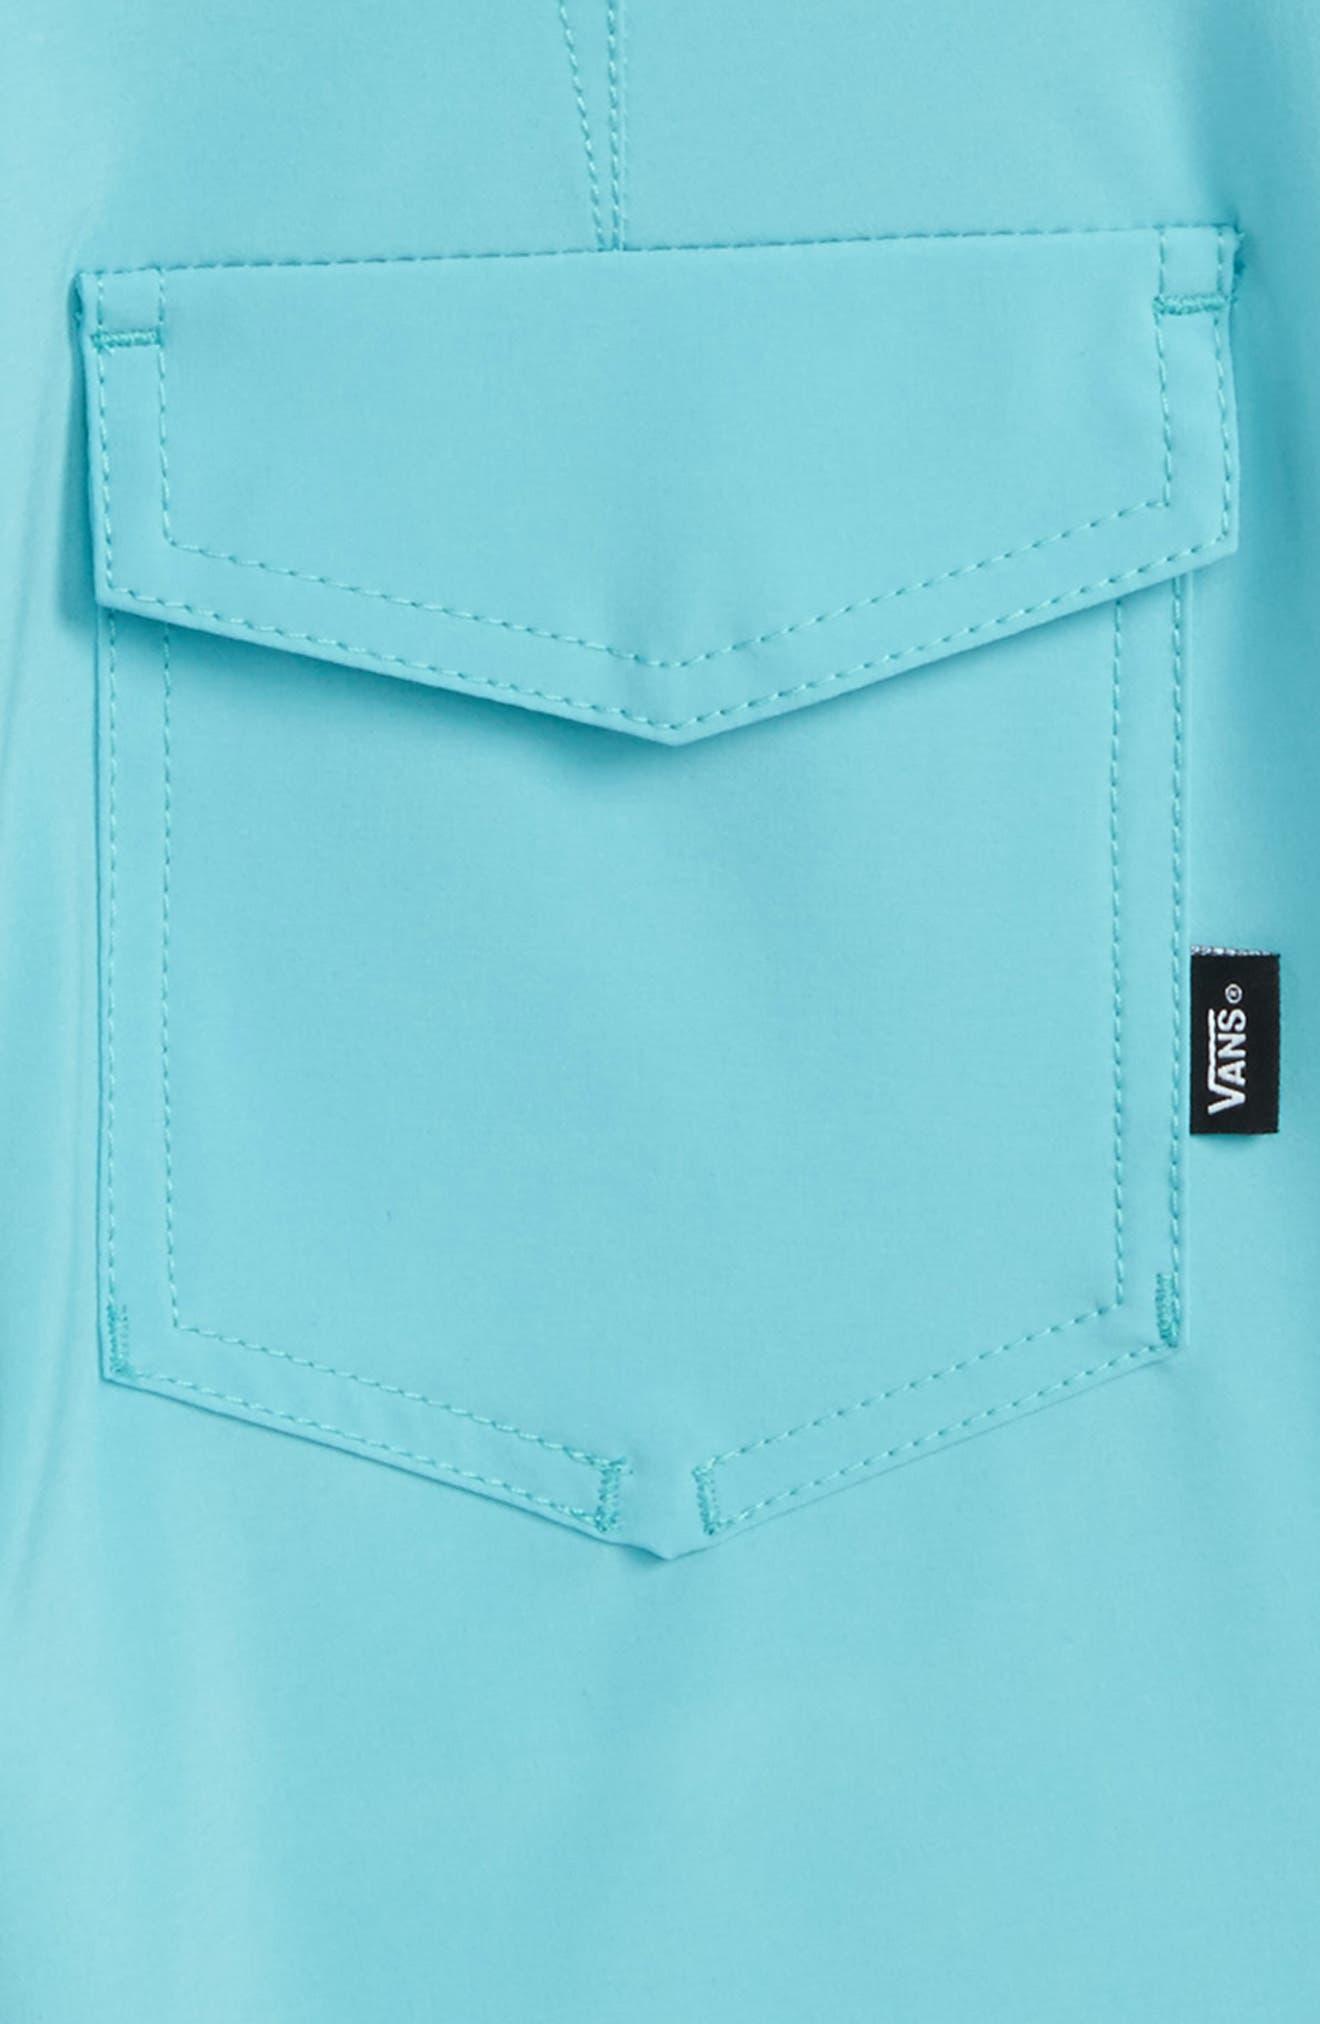 Sidestripe Board Shorts,                             Alternate thumbnail 3, color,                             Aquarelle